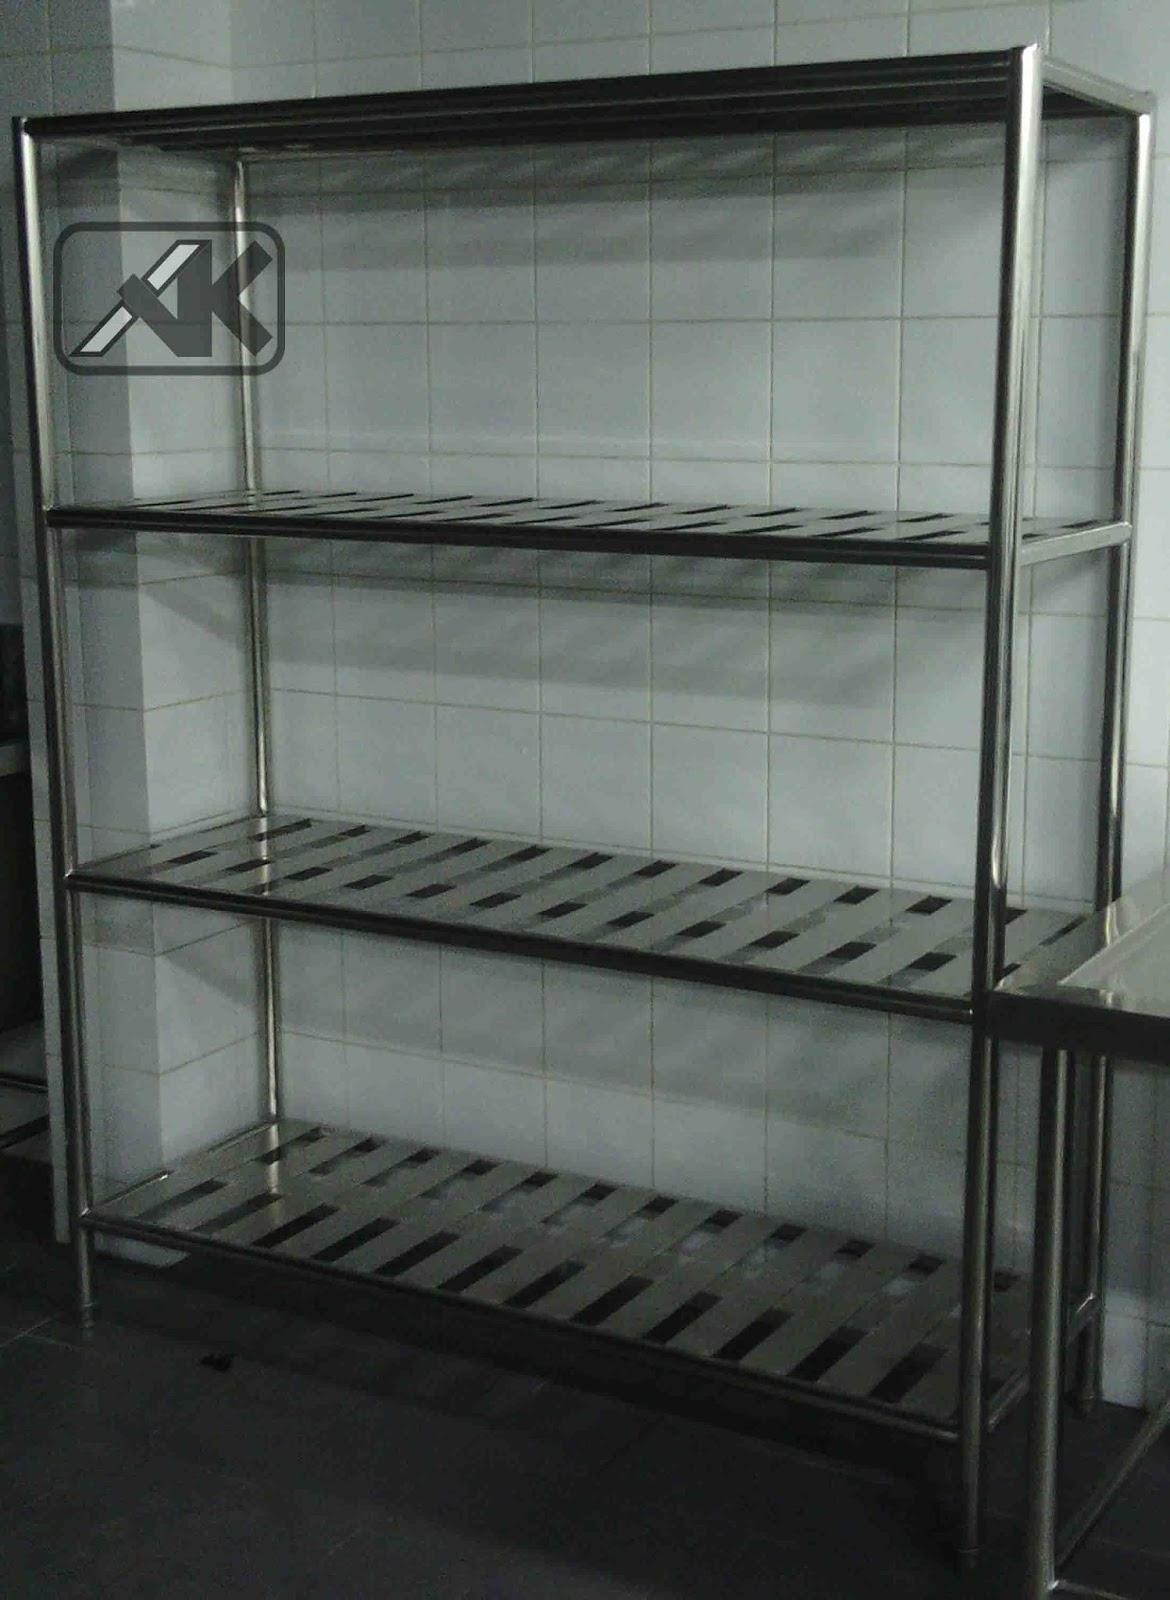 Aries kitchen specialist daftar list harga peralatan for Daftar harga kitchen set stainless steel